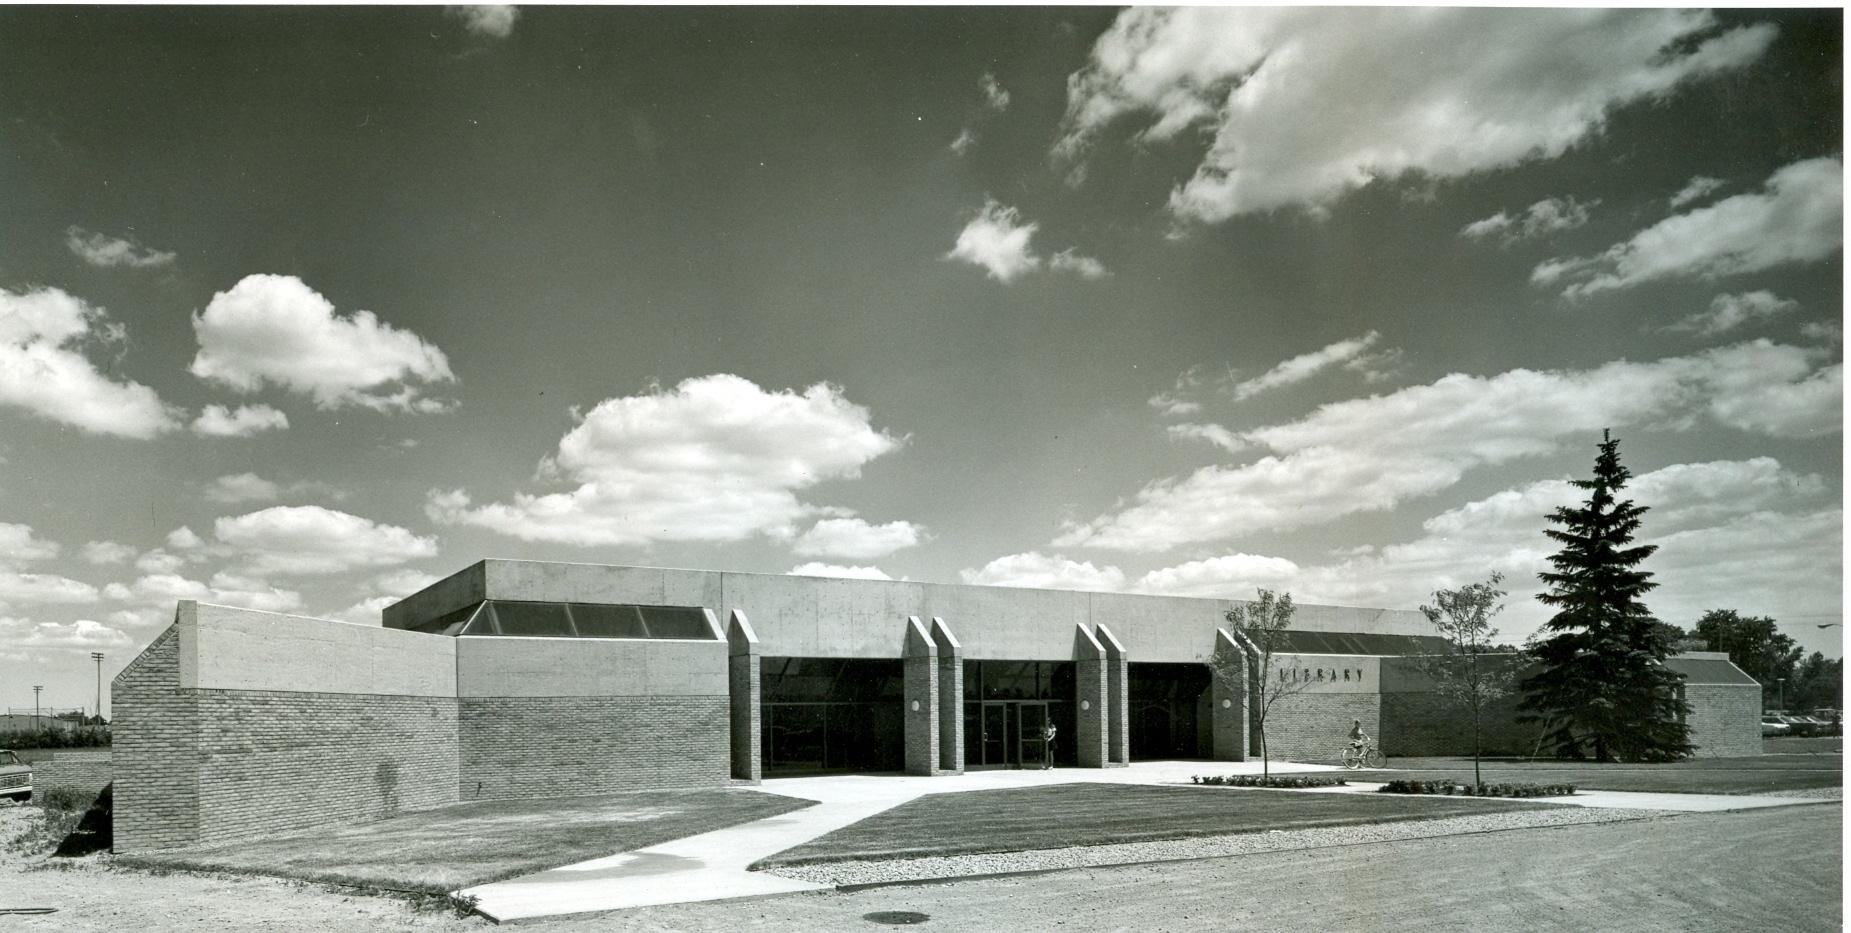 Original Troy Public Library 1971